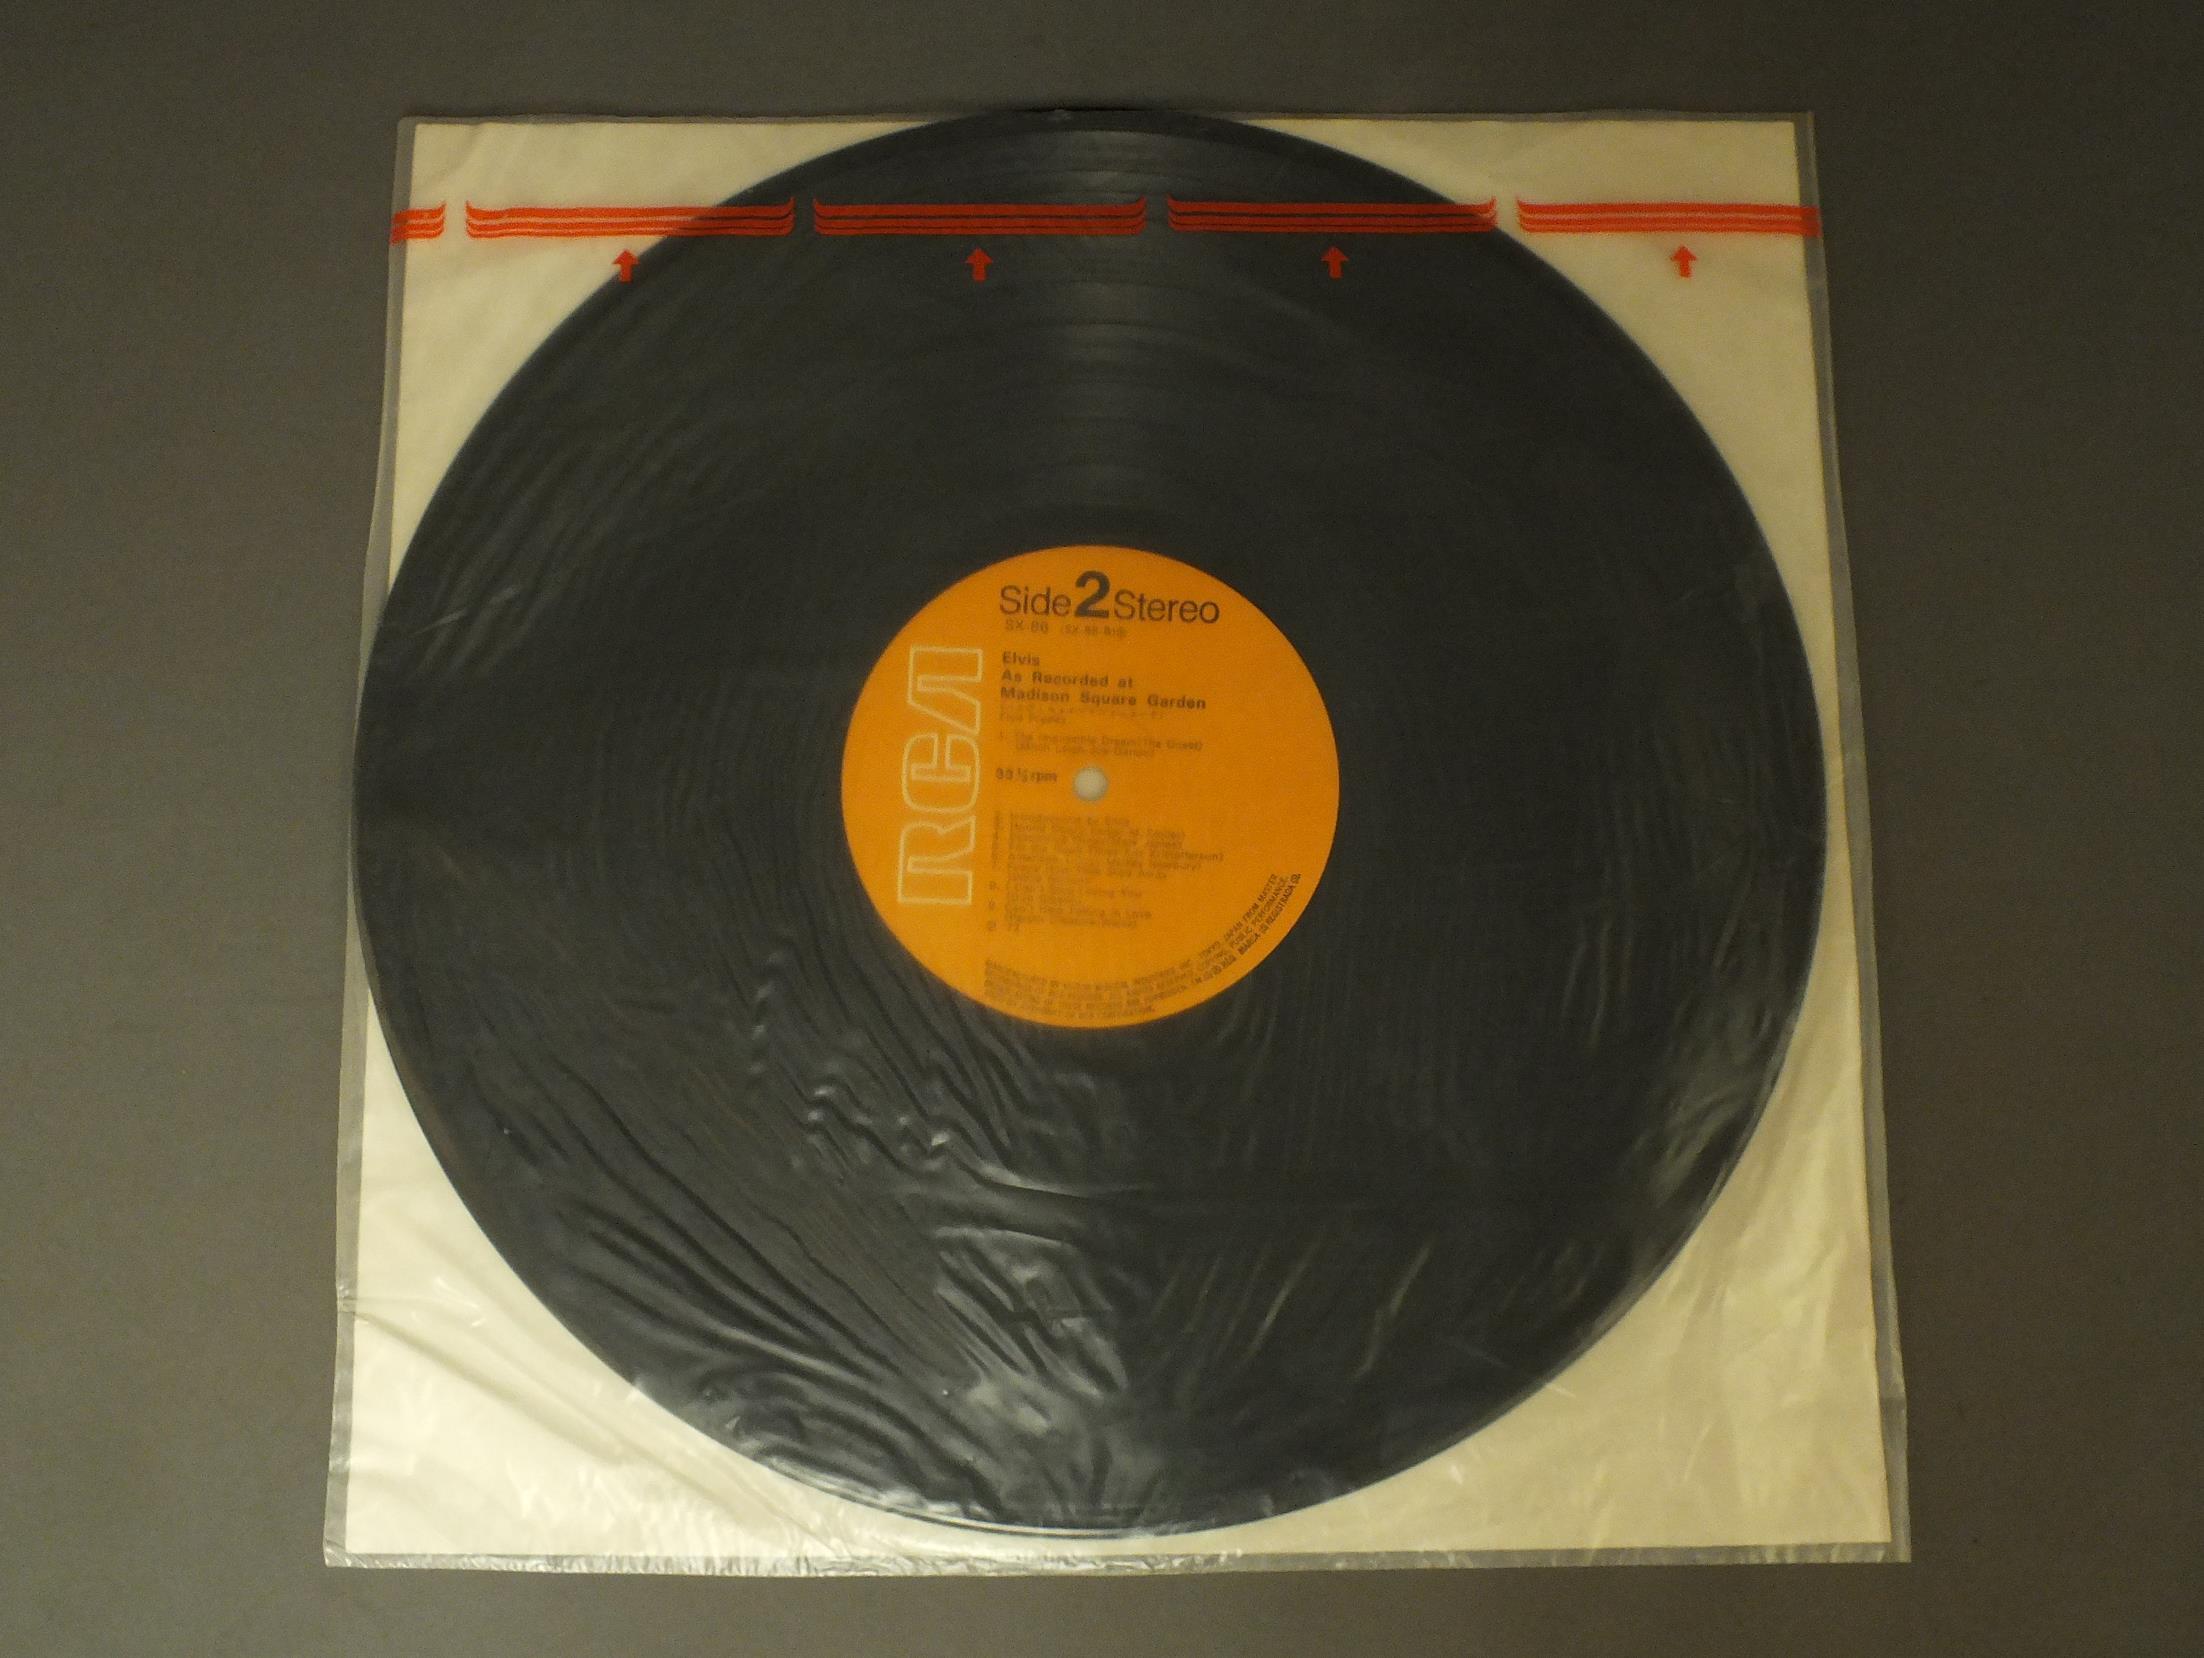 ELVISエルヴィス・プレスリー/ELVIS AS RECORDED AT MADISON SQUARE GARDENエルヴィス・イン・ニューヨーク SX86